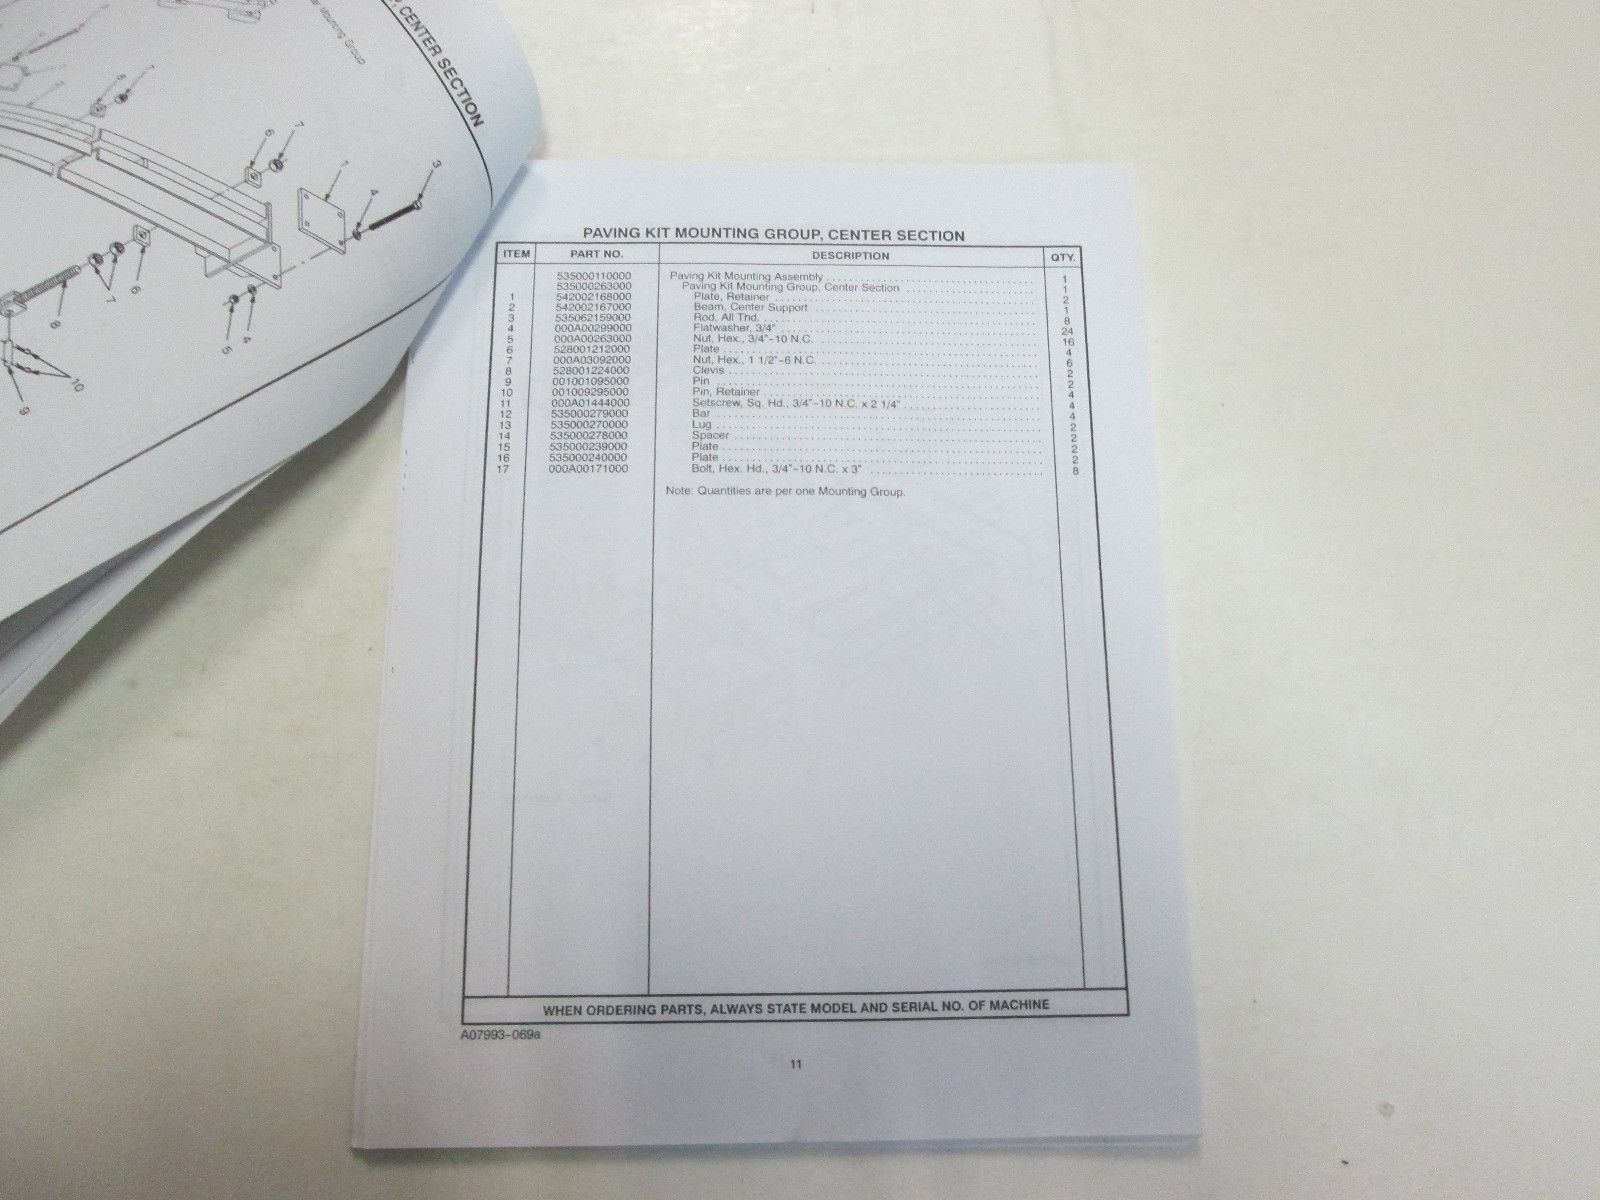 2000 CMI Corporation Series II Slipform Paving Kit Parts Manual FACTORY OEM DEAL